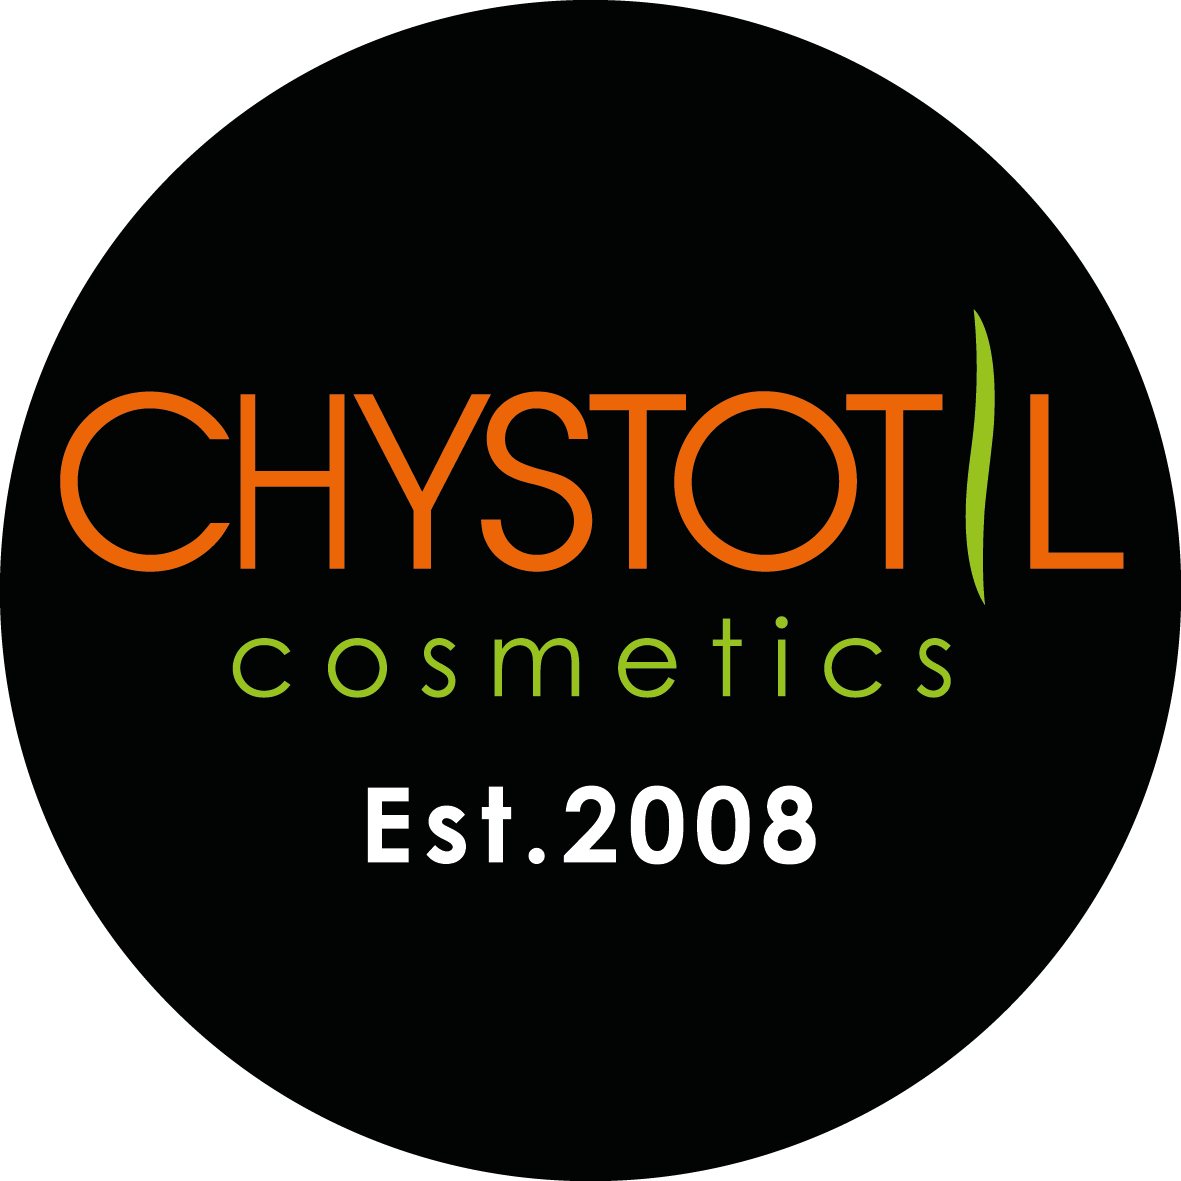 CHYSTOTIL Cosmetics